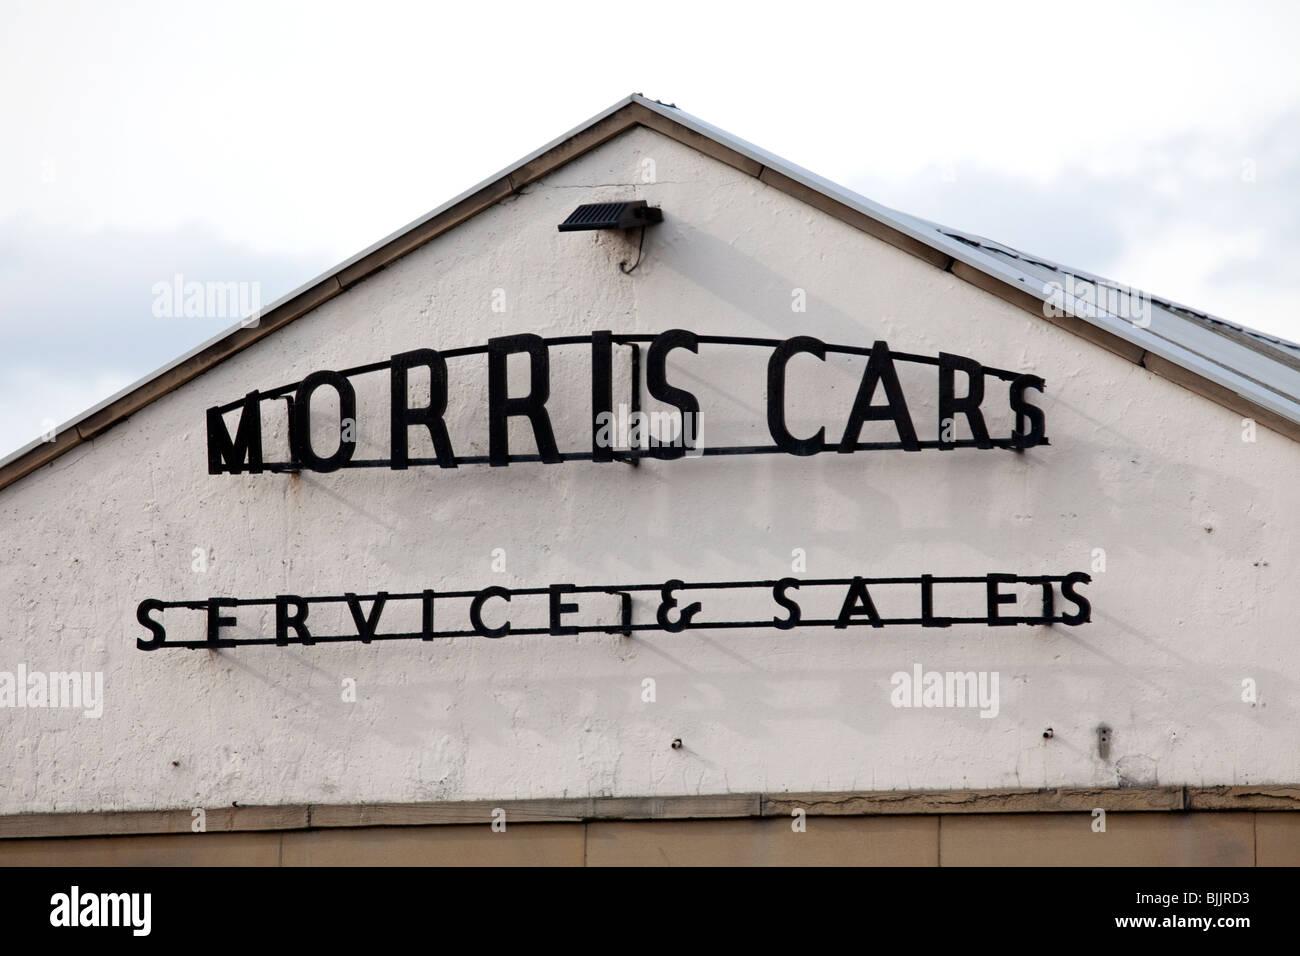 Old Garage Signs : Old garage sign depicting morris cars service and sales